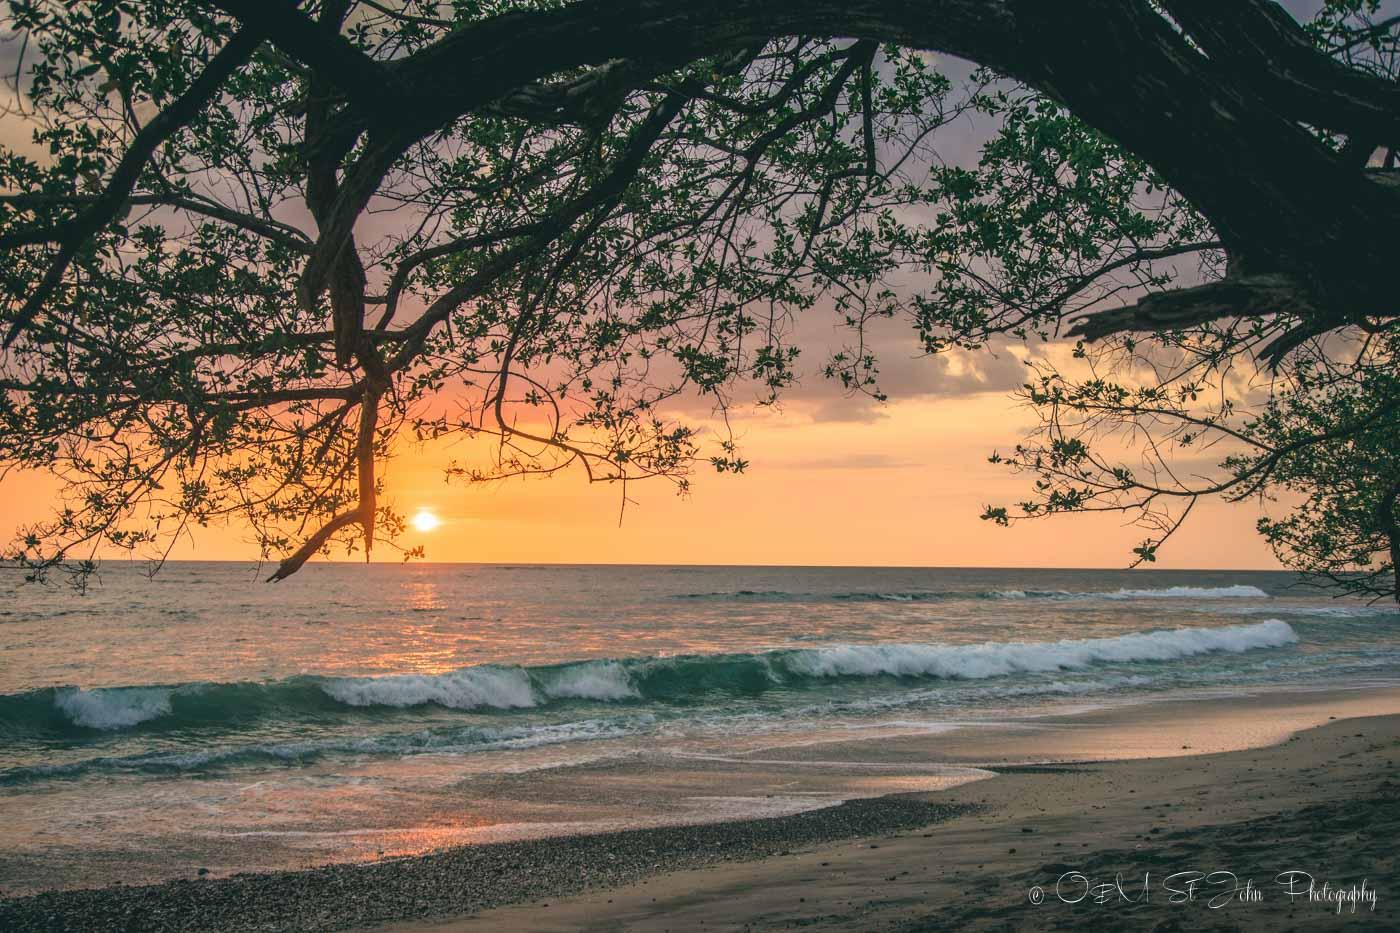 Sunset in Playa LAgartillo, Guanacaste, Costa Rica